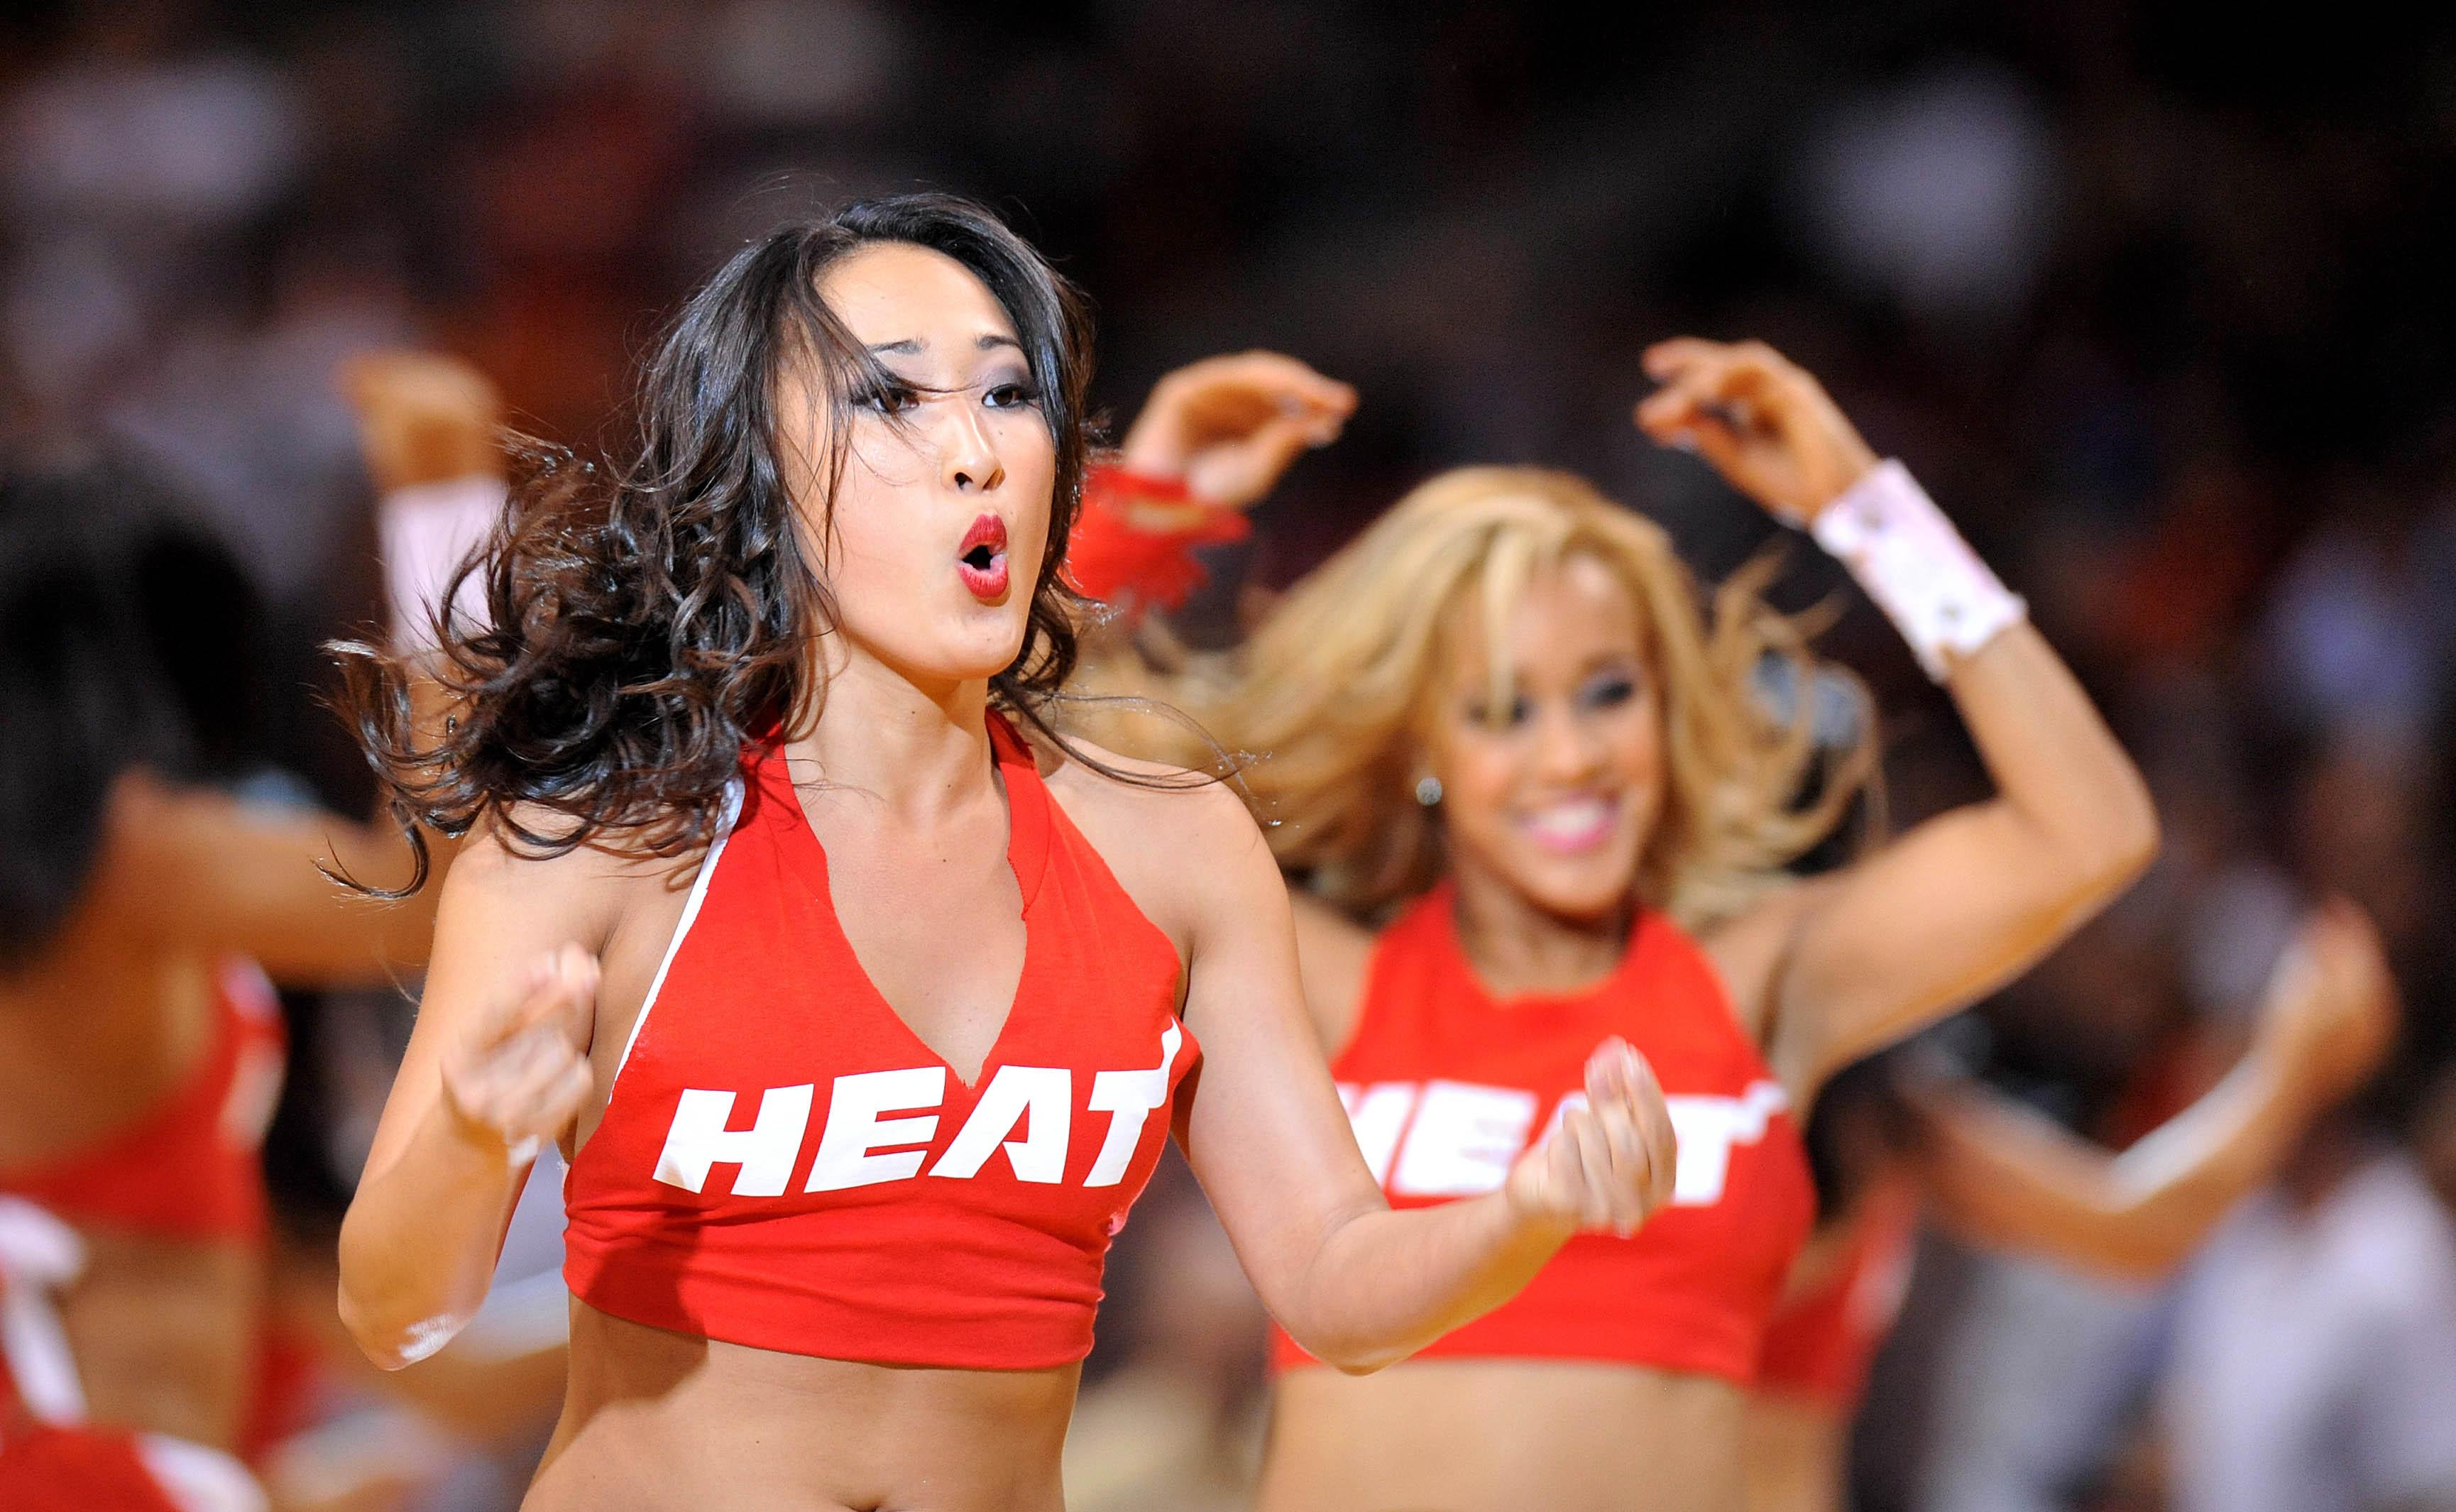 Naked miami heat cheerleaders